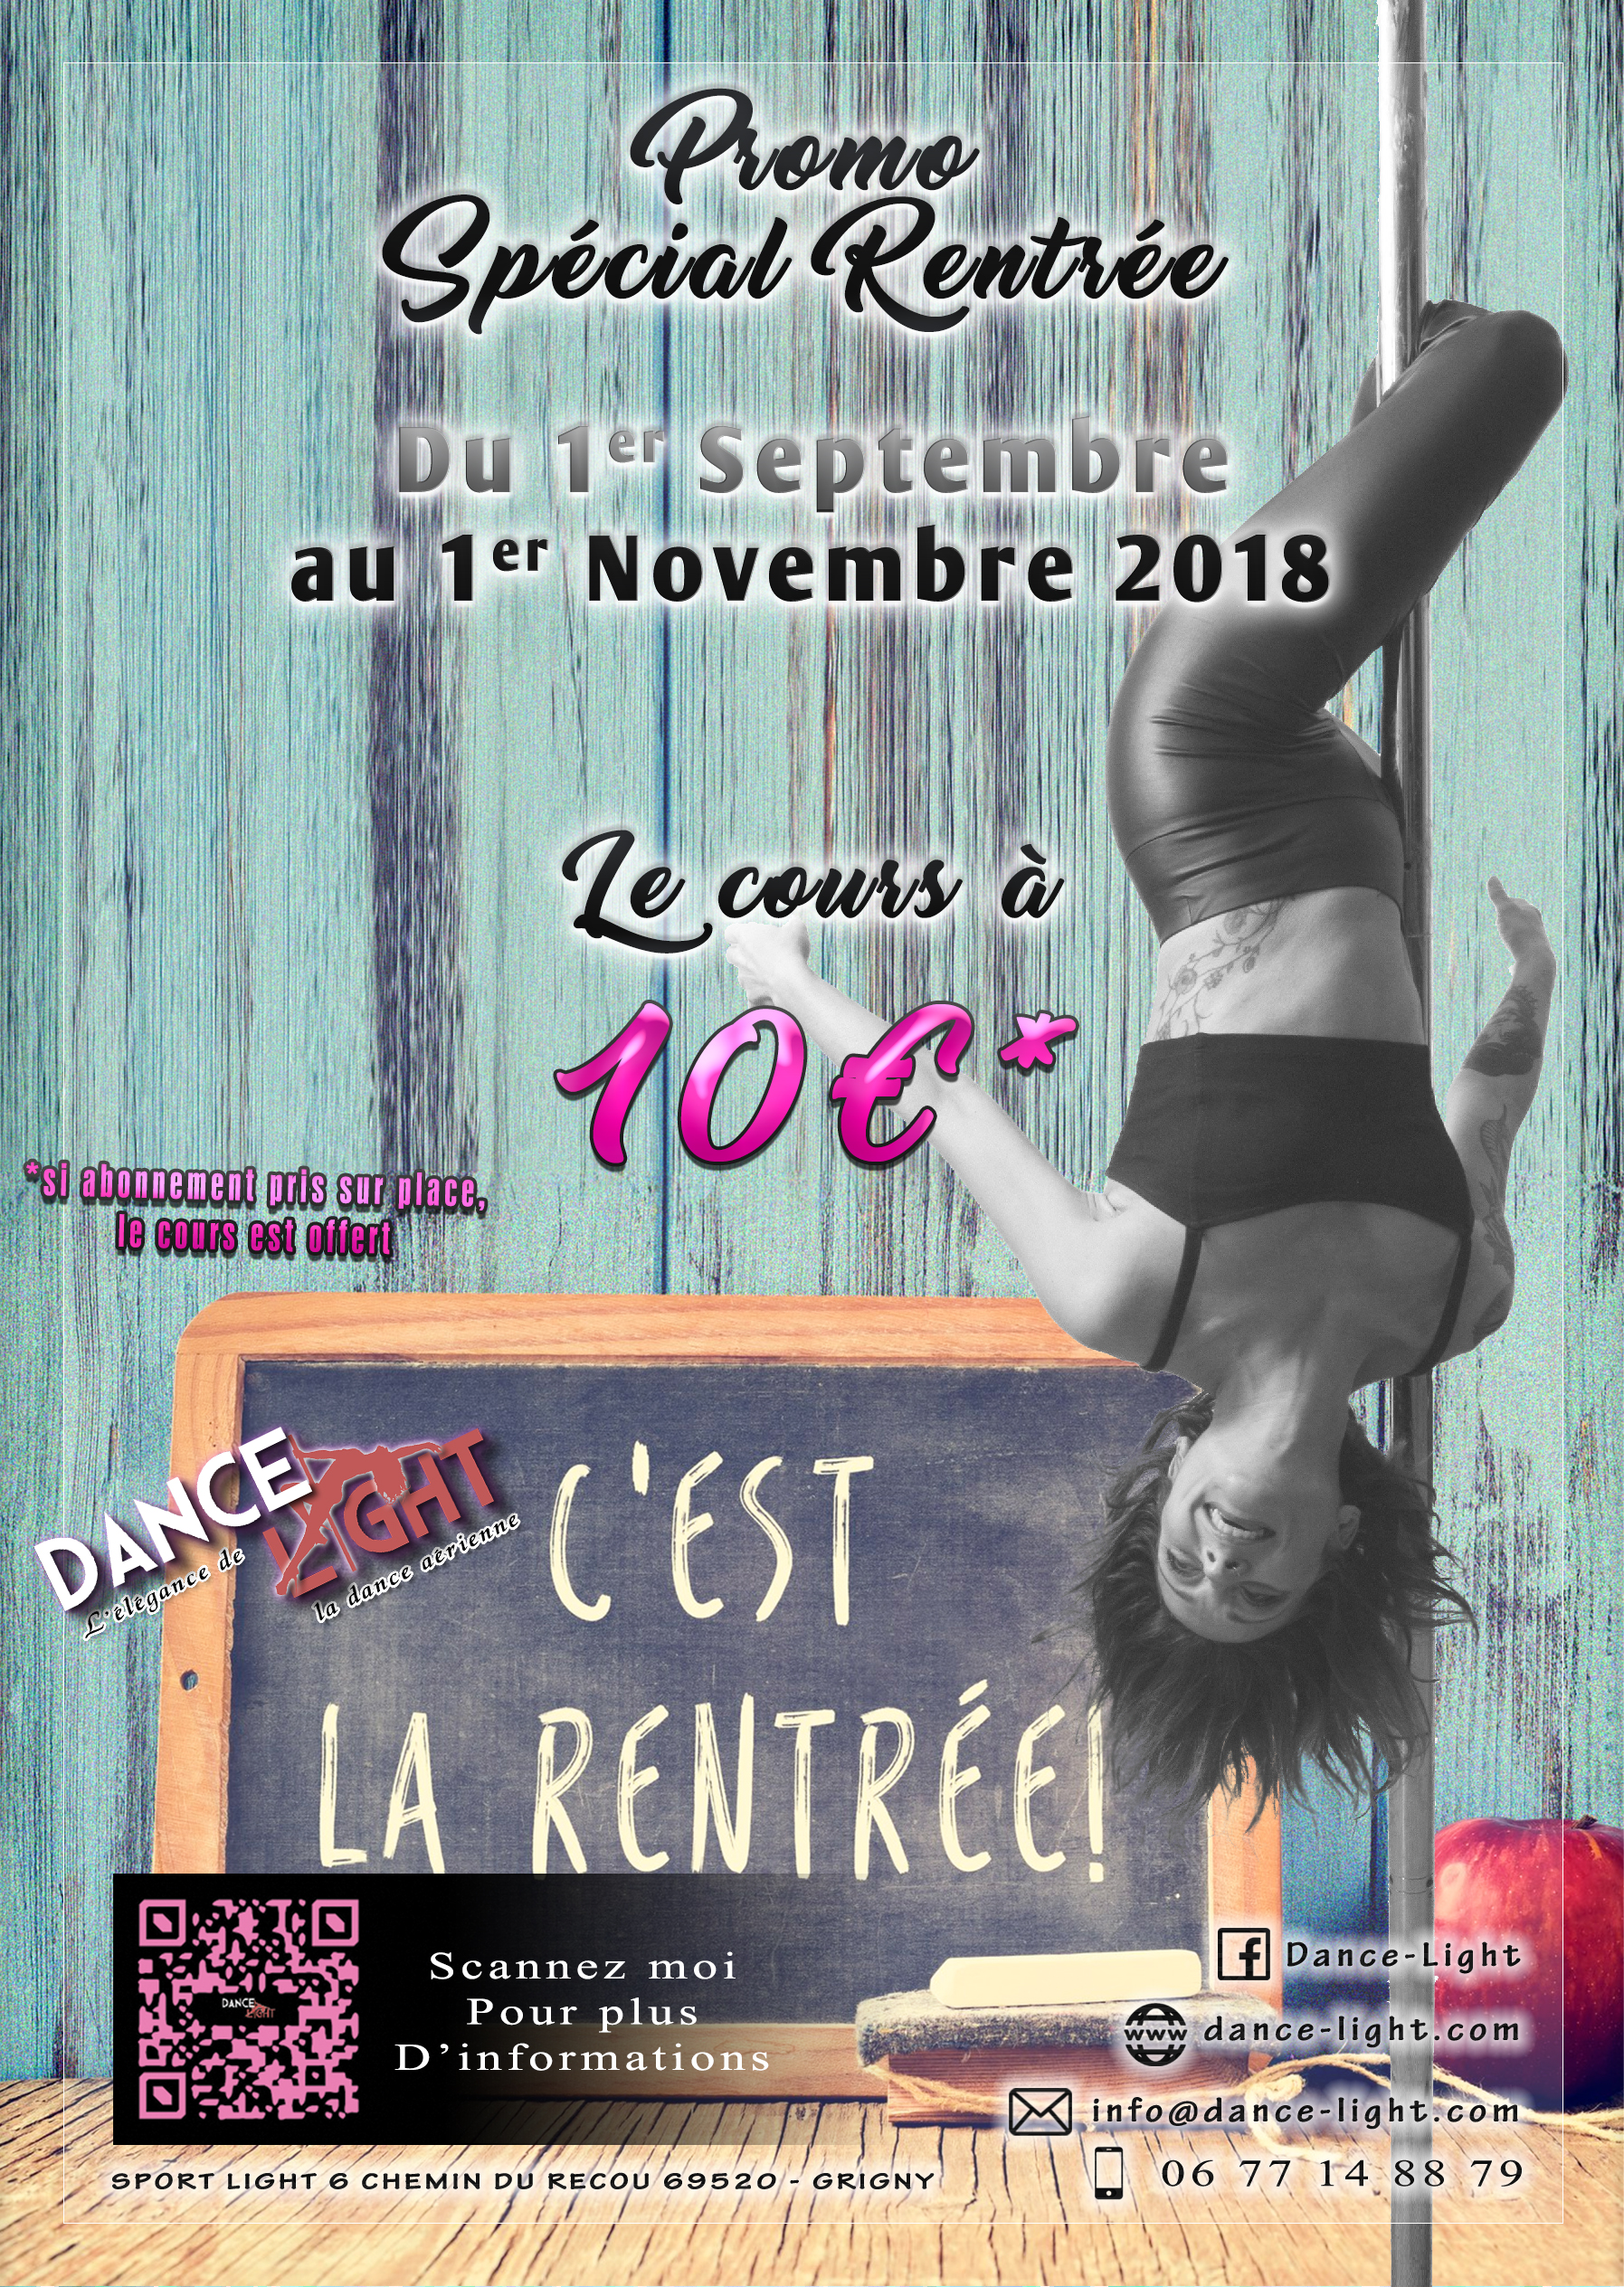 Promo Rentrée septembre 2018